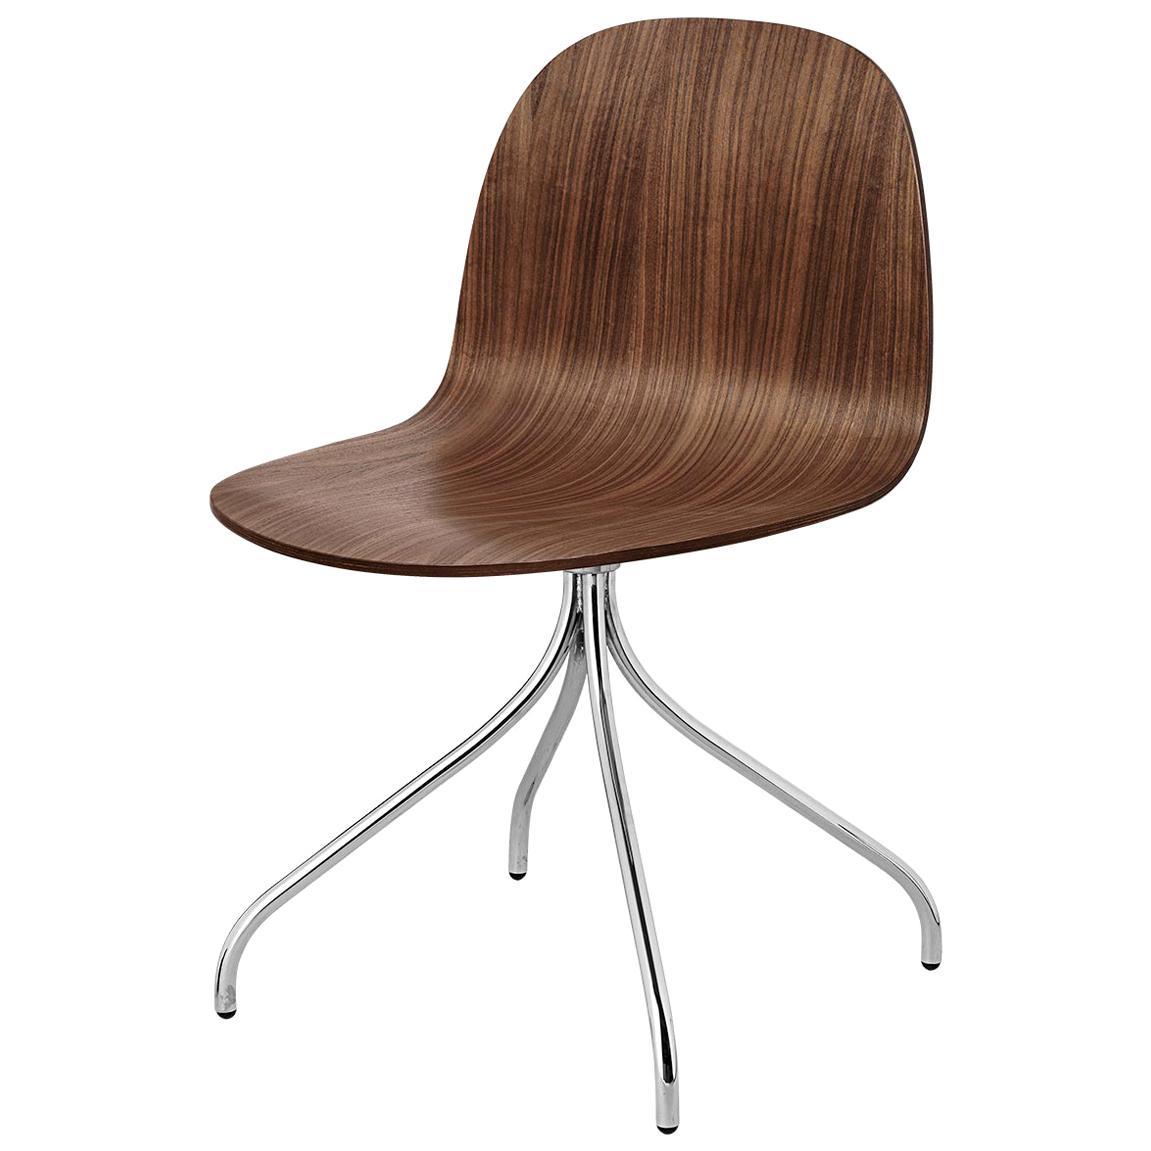 2D Meeting Chair, Un Upholstered, Chrome Swivel Base, Walnut